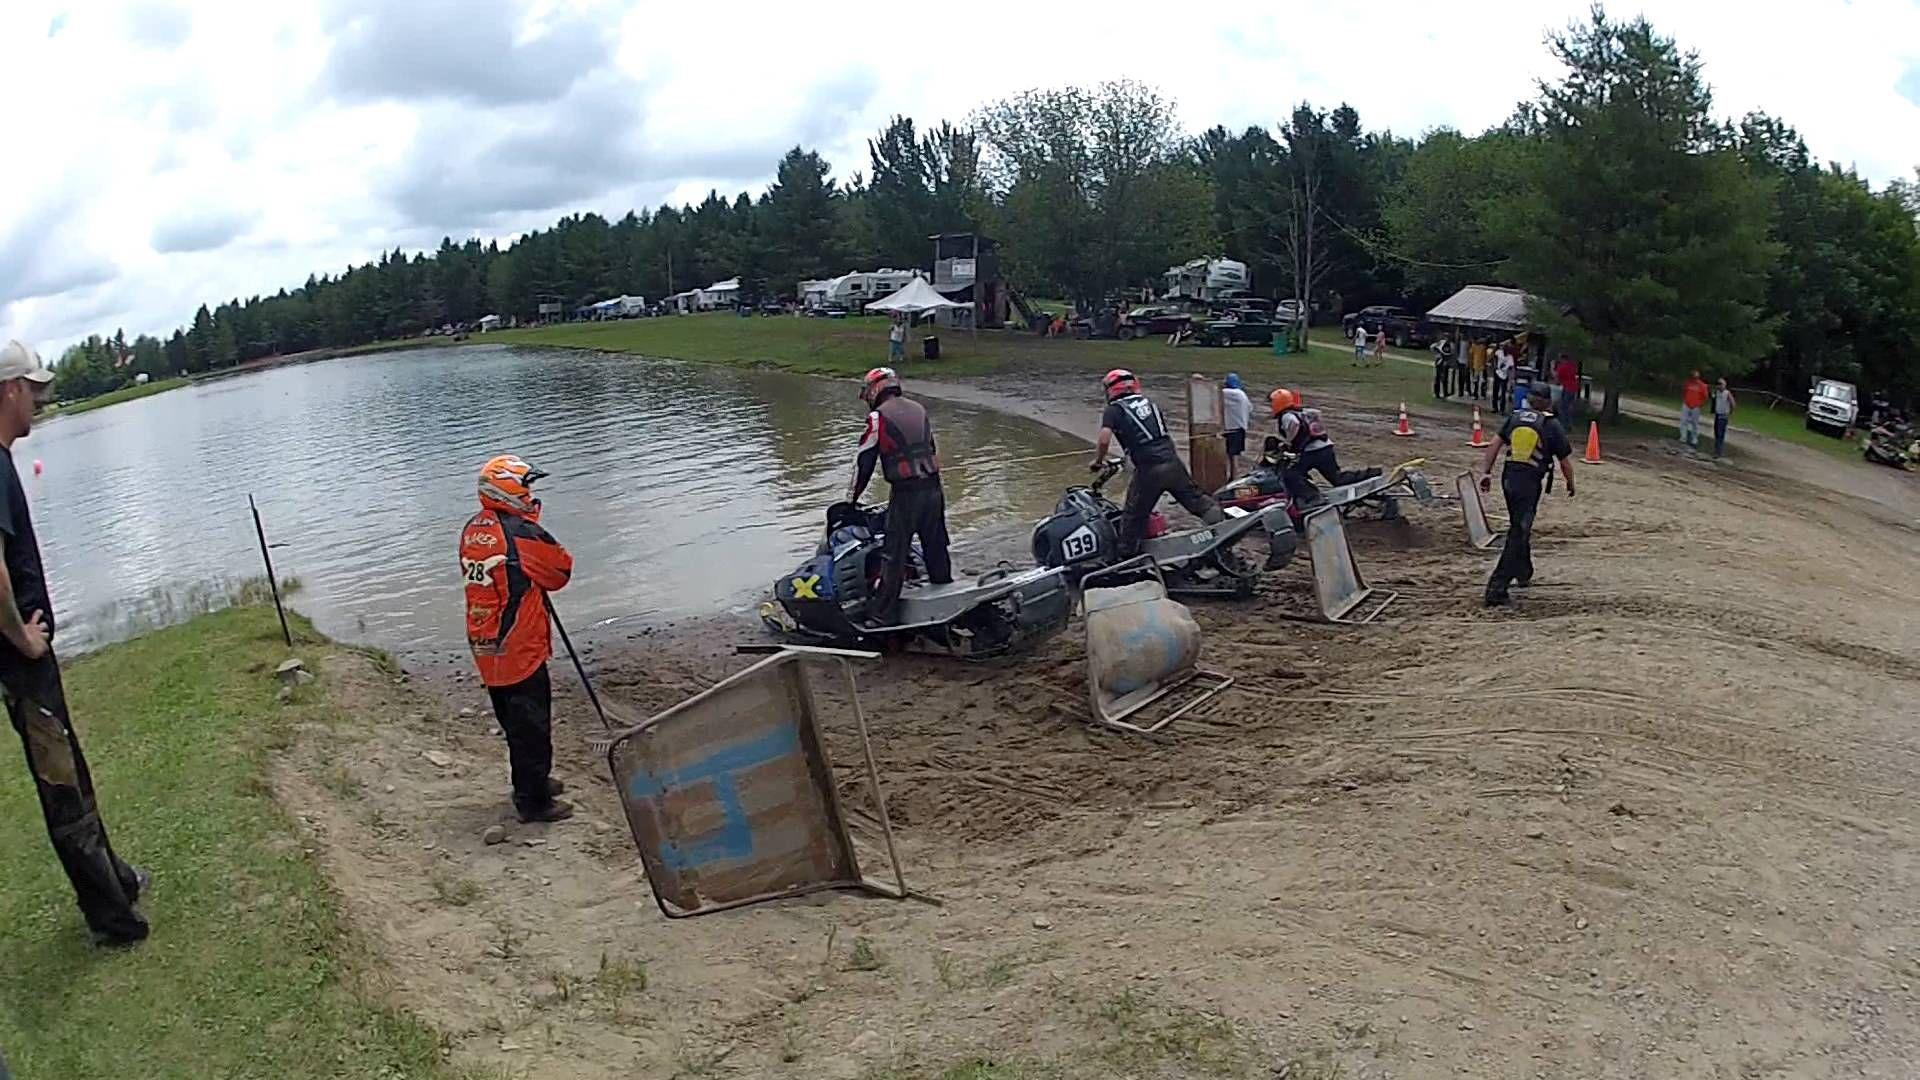 tug hill ny watercross races flatrock inn 7-14-2013